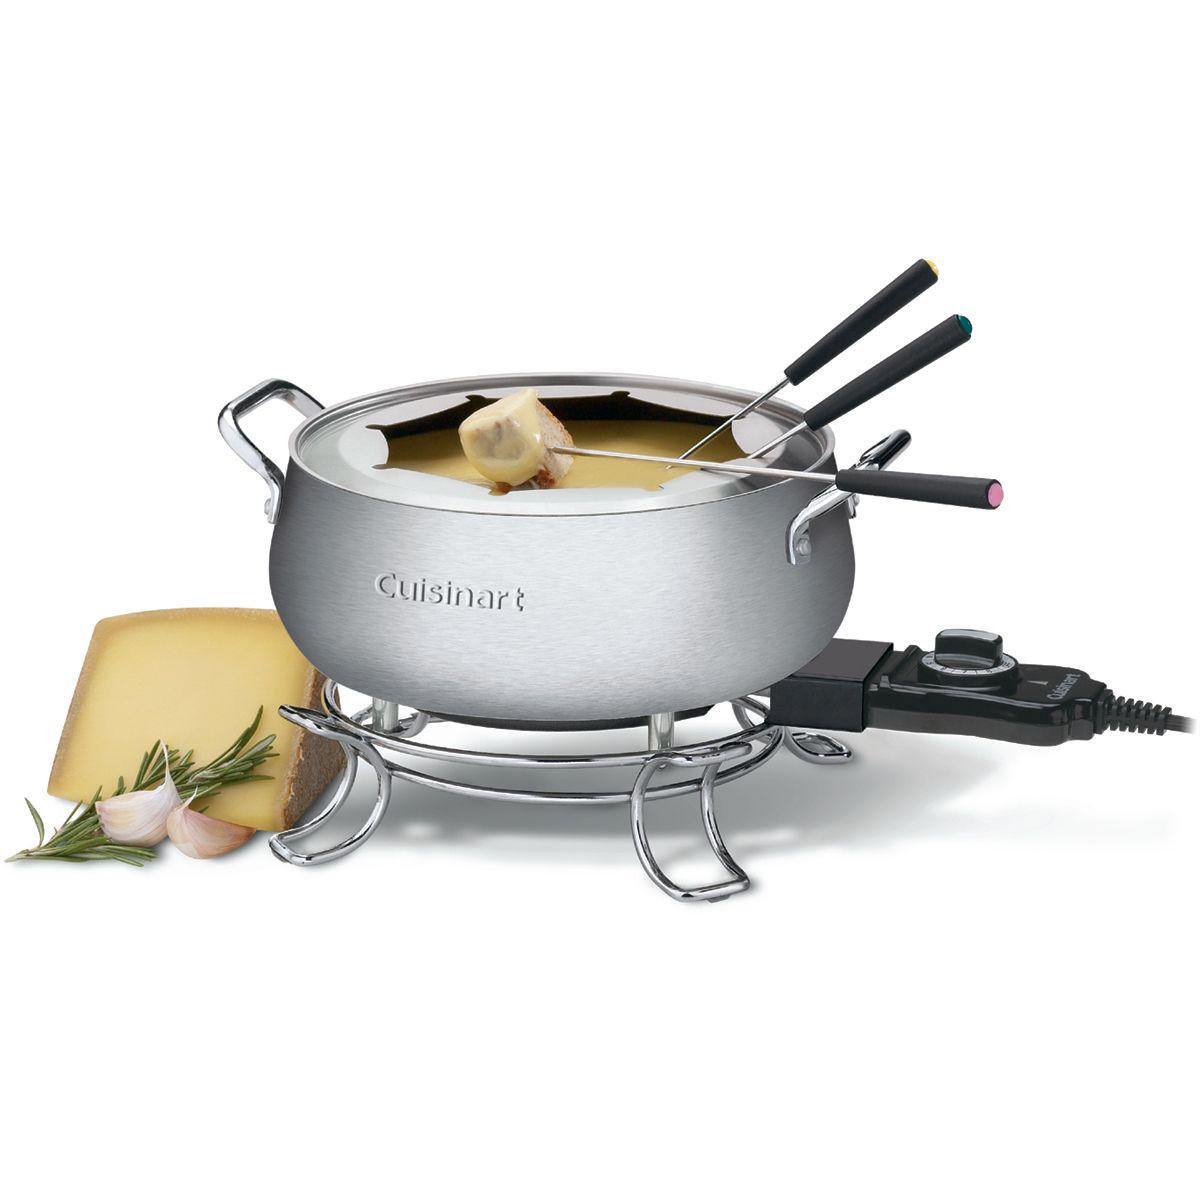 Cuisinart canada cuisinart electric fondue pot cfo3ssc